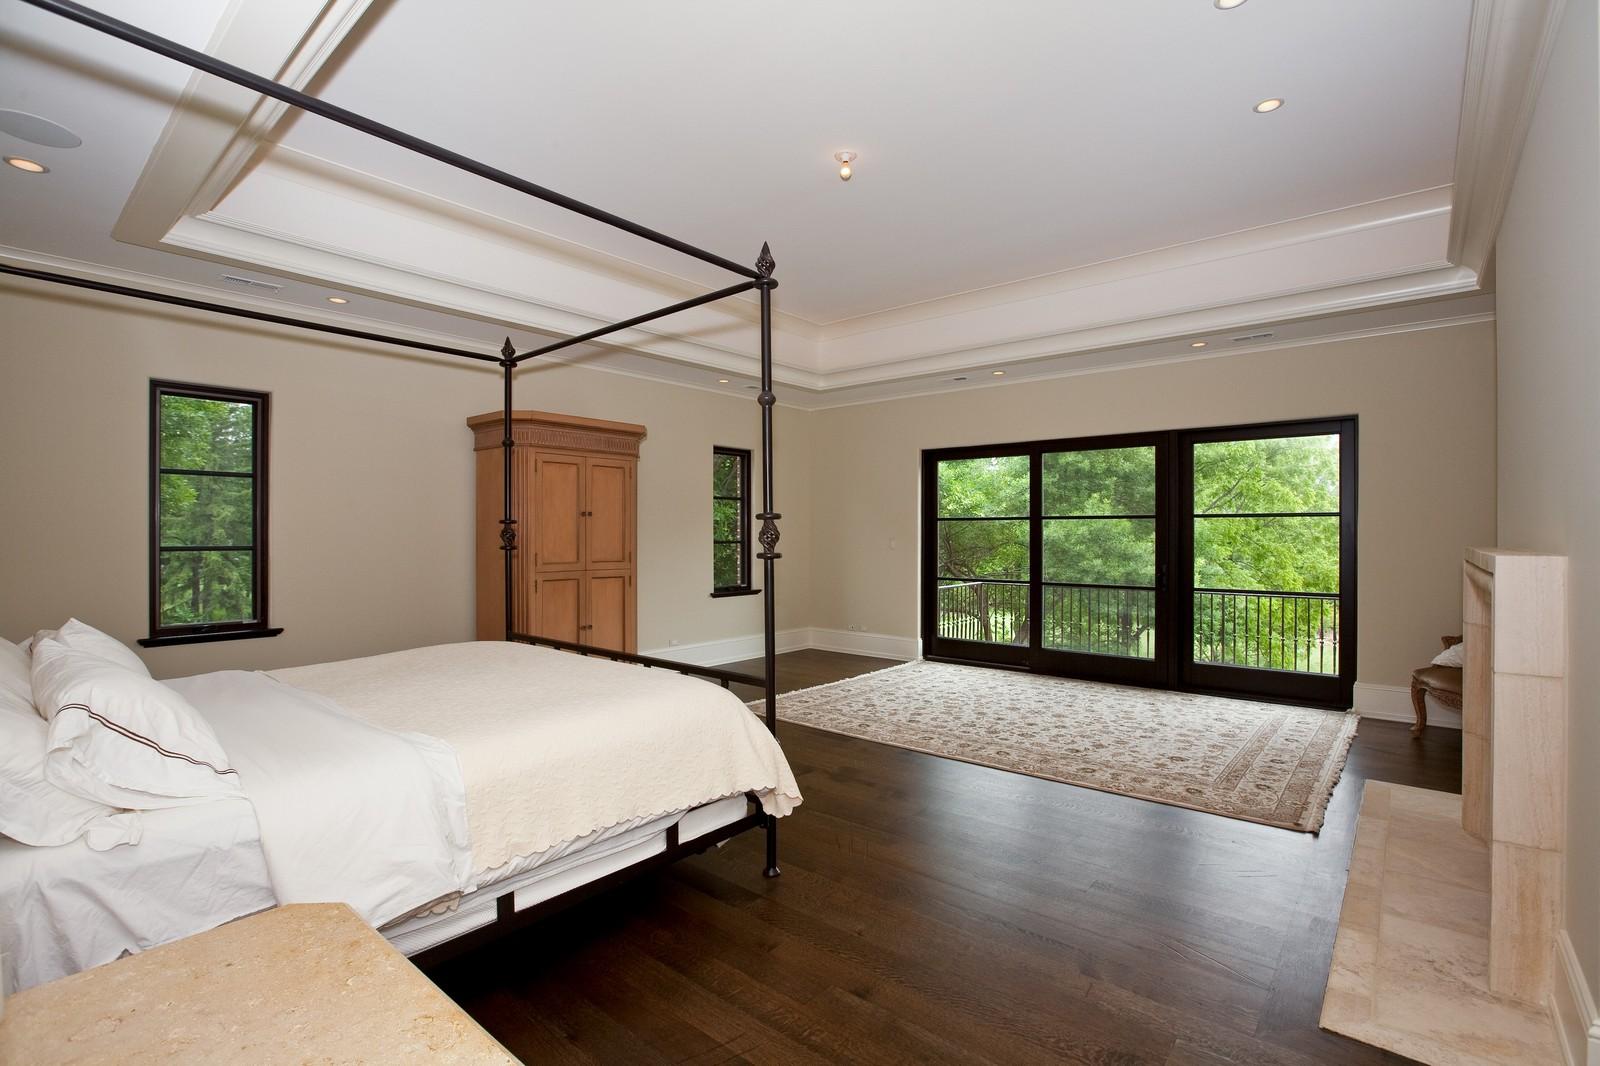 Real Estate Photography - 6143 Madison, Burr Ridge, IL, 60527 - Master Bedroom